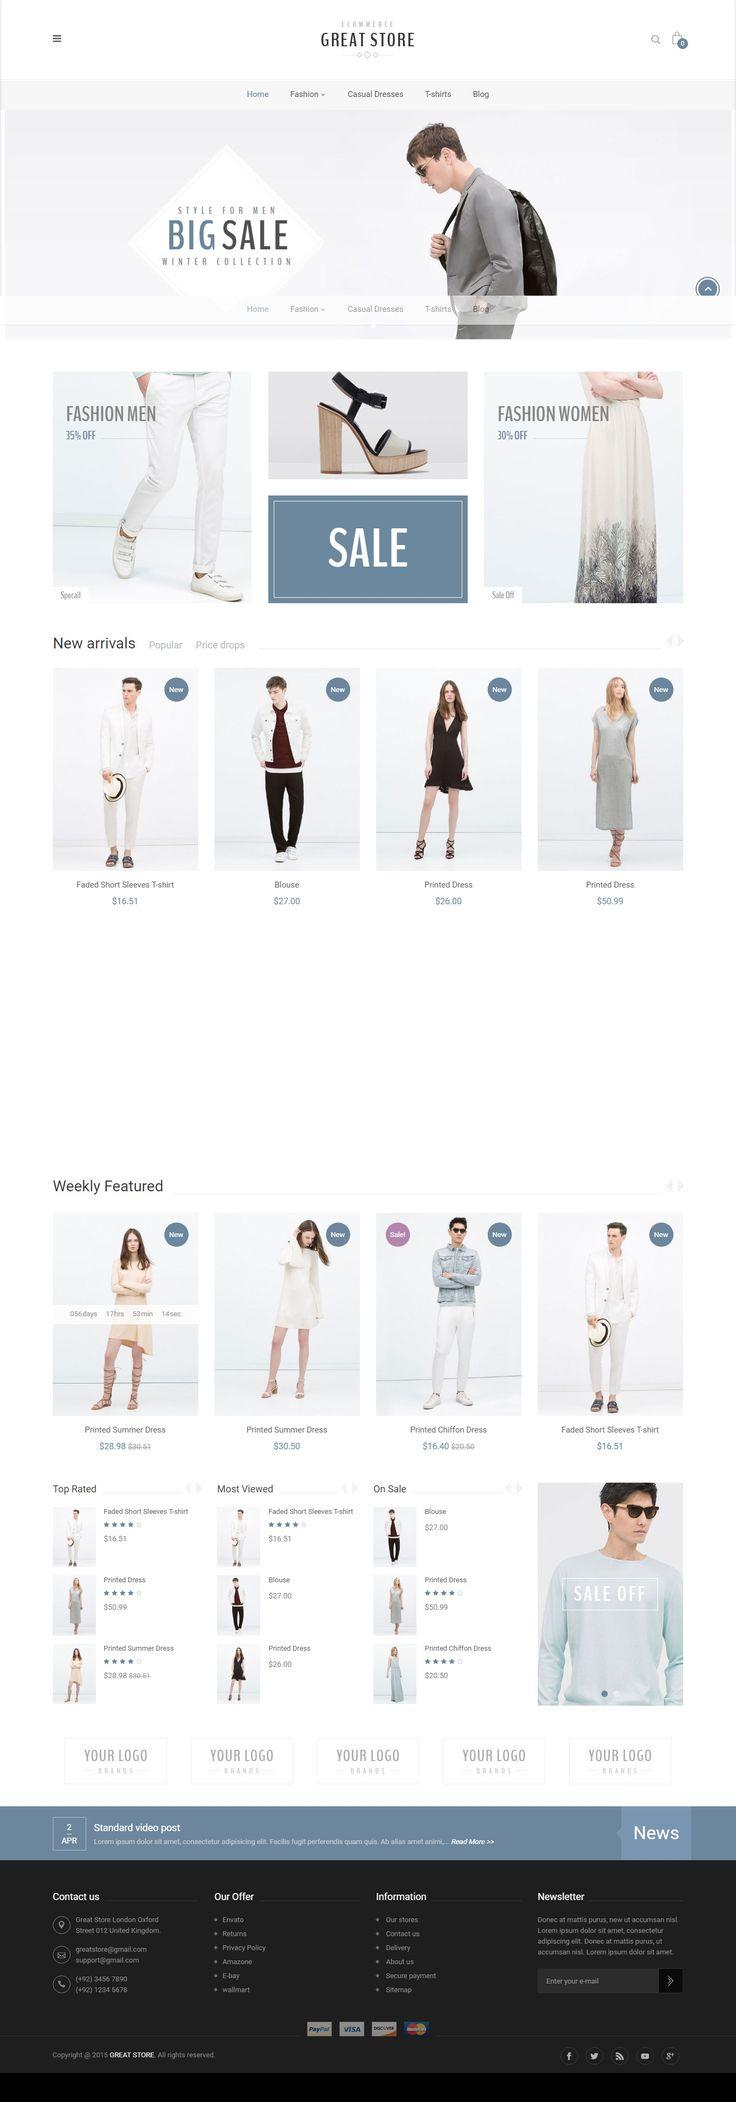 #YesThemes.net - Free download GREAT STORE - eCommerce Prestashop Theme -----------Free download this Prestashop theme: YesThemes.net------------- #Prestashop #theme, Prestashop #1.7, #free prestashop theme, prestashop theme #nulled, free #download, prestashop #design, prestashop #website, #beautiful prestashop theme